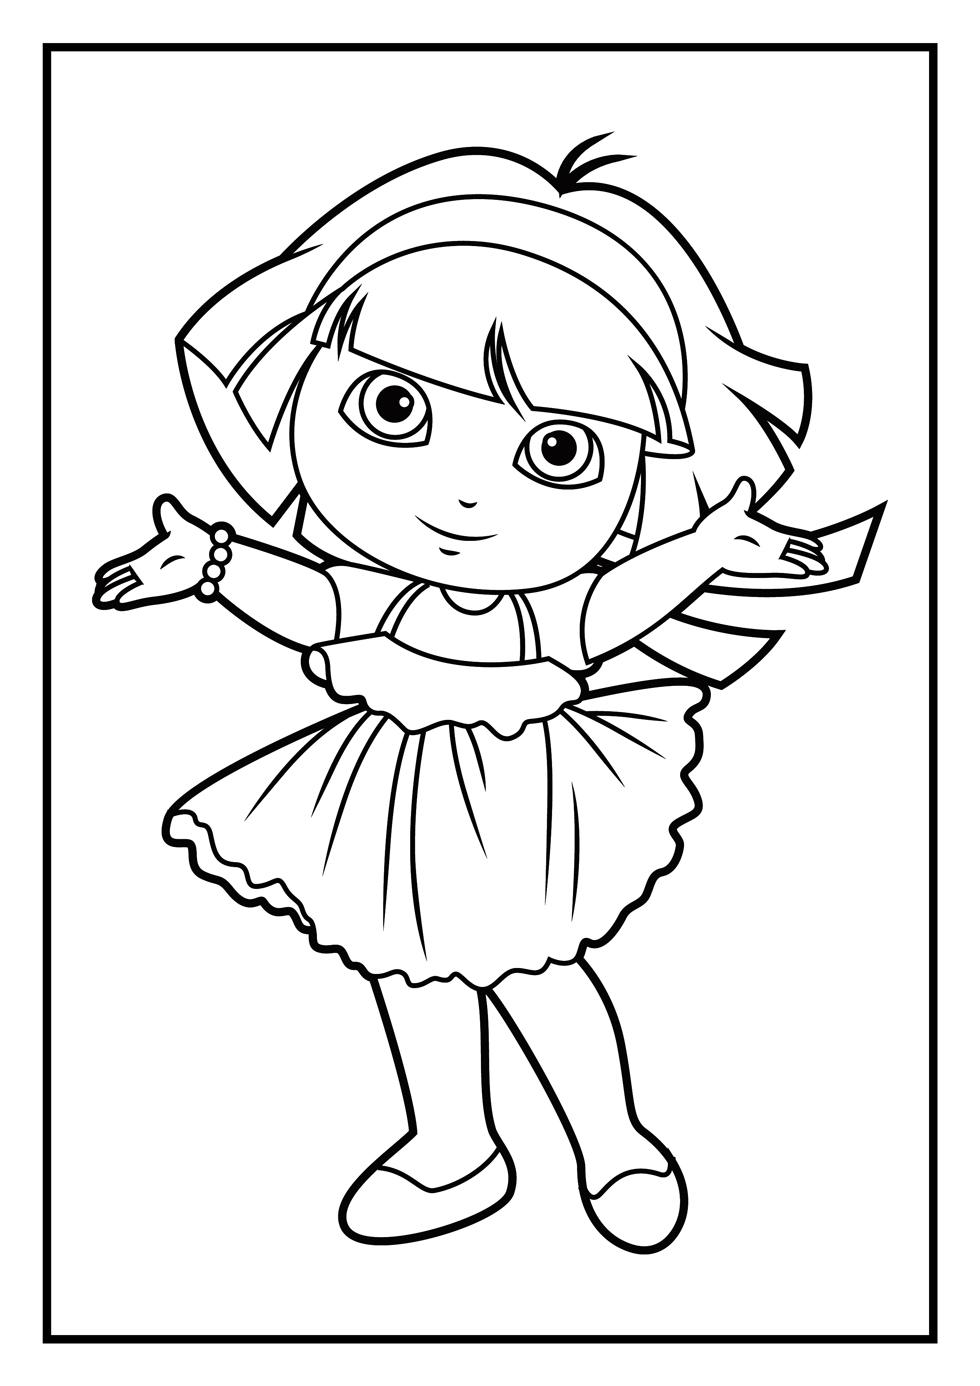 Dora The Explorer Worksheets Free | Printable Worksheets and ... | 1386x980